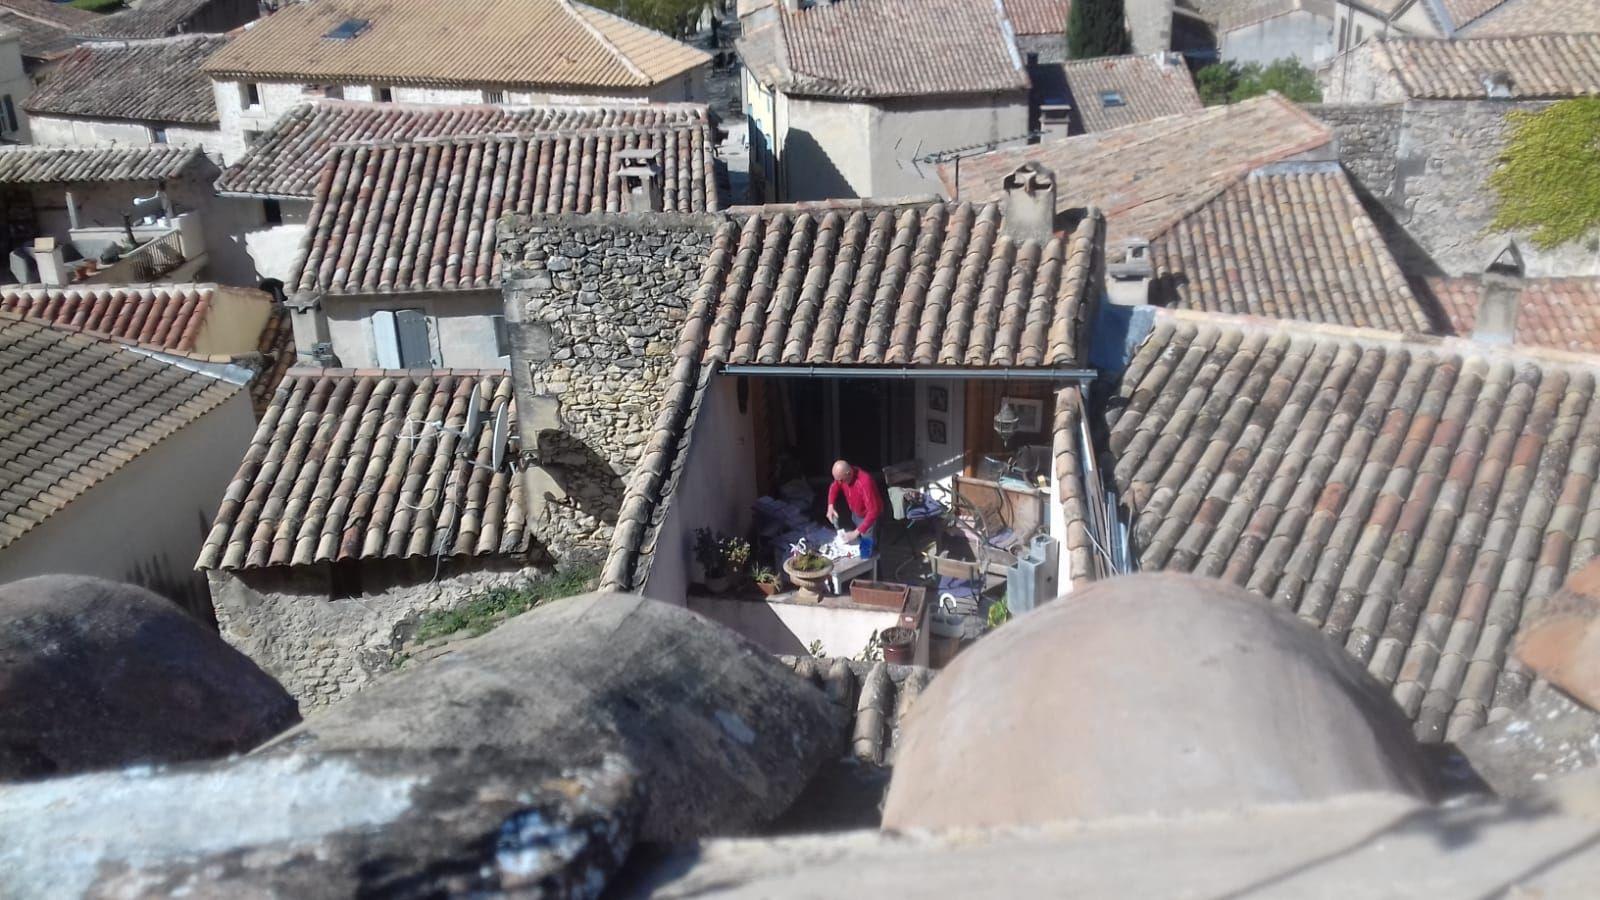 Sur la terrasse voisine le voisin bricole.